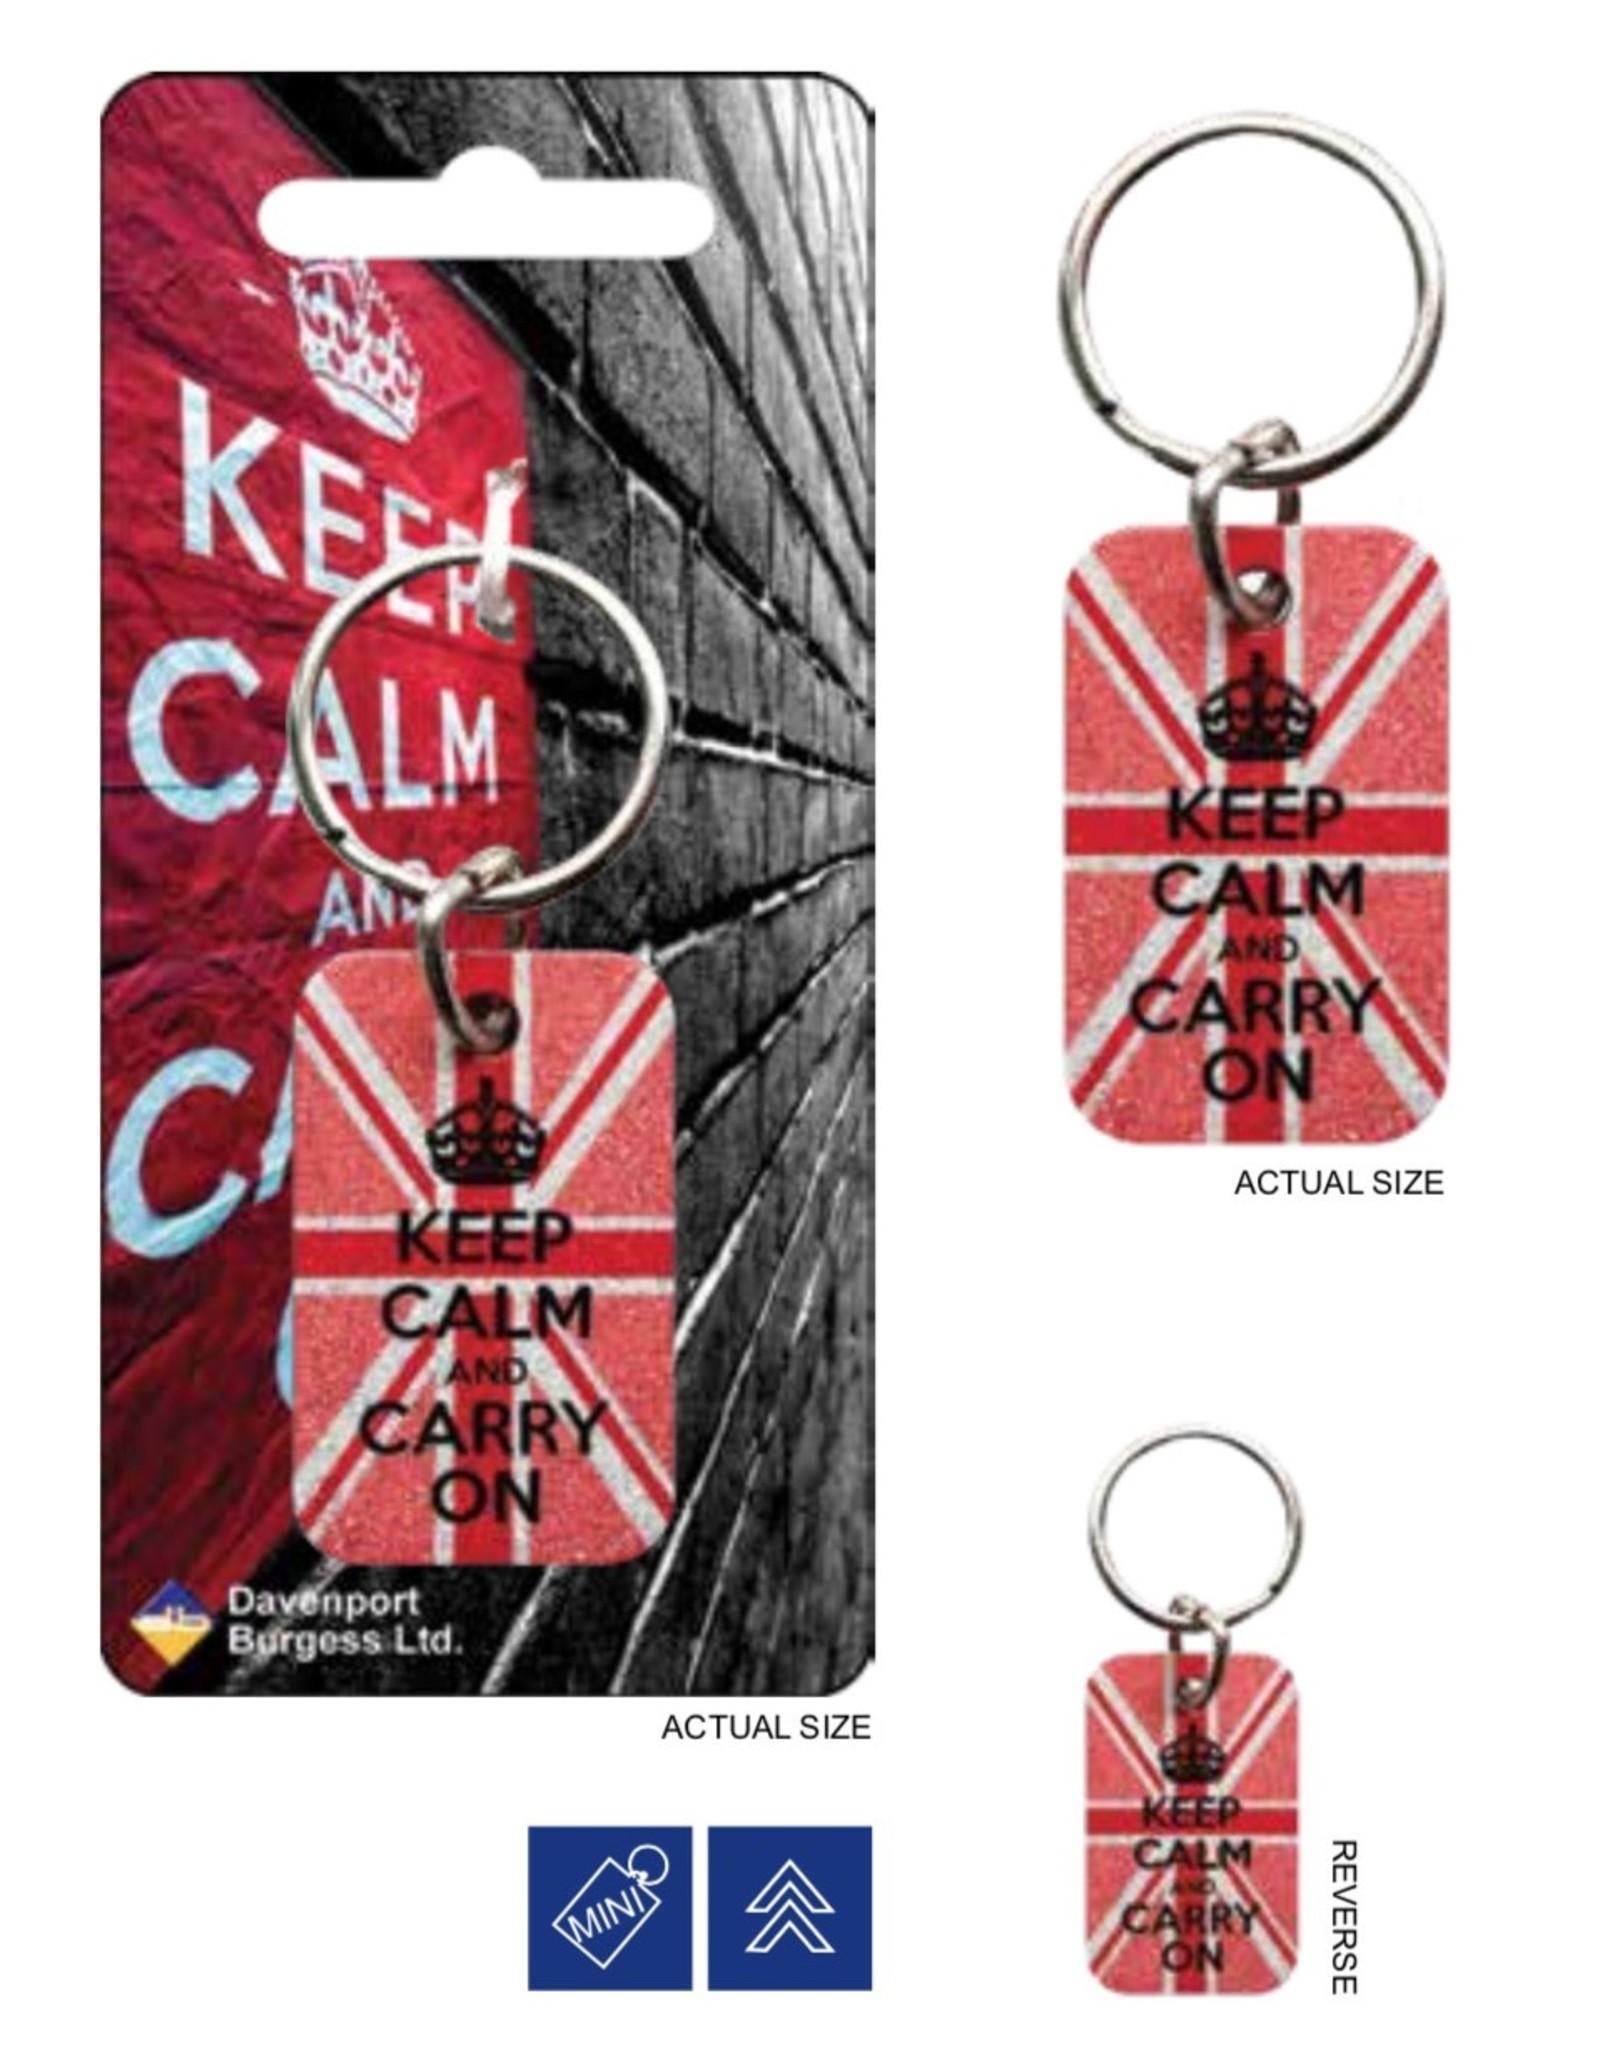 KEEP CALM Metal Keychain - Glitter Pink